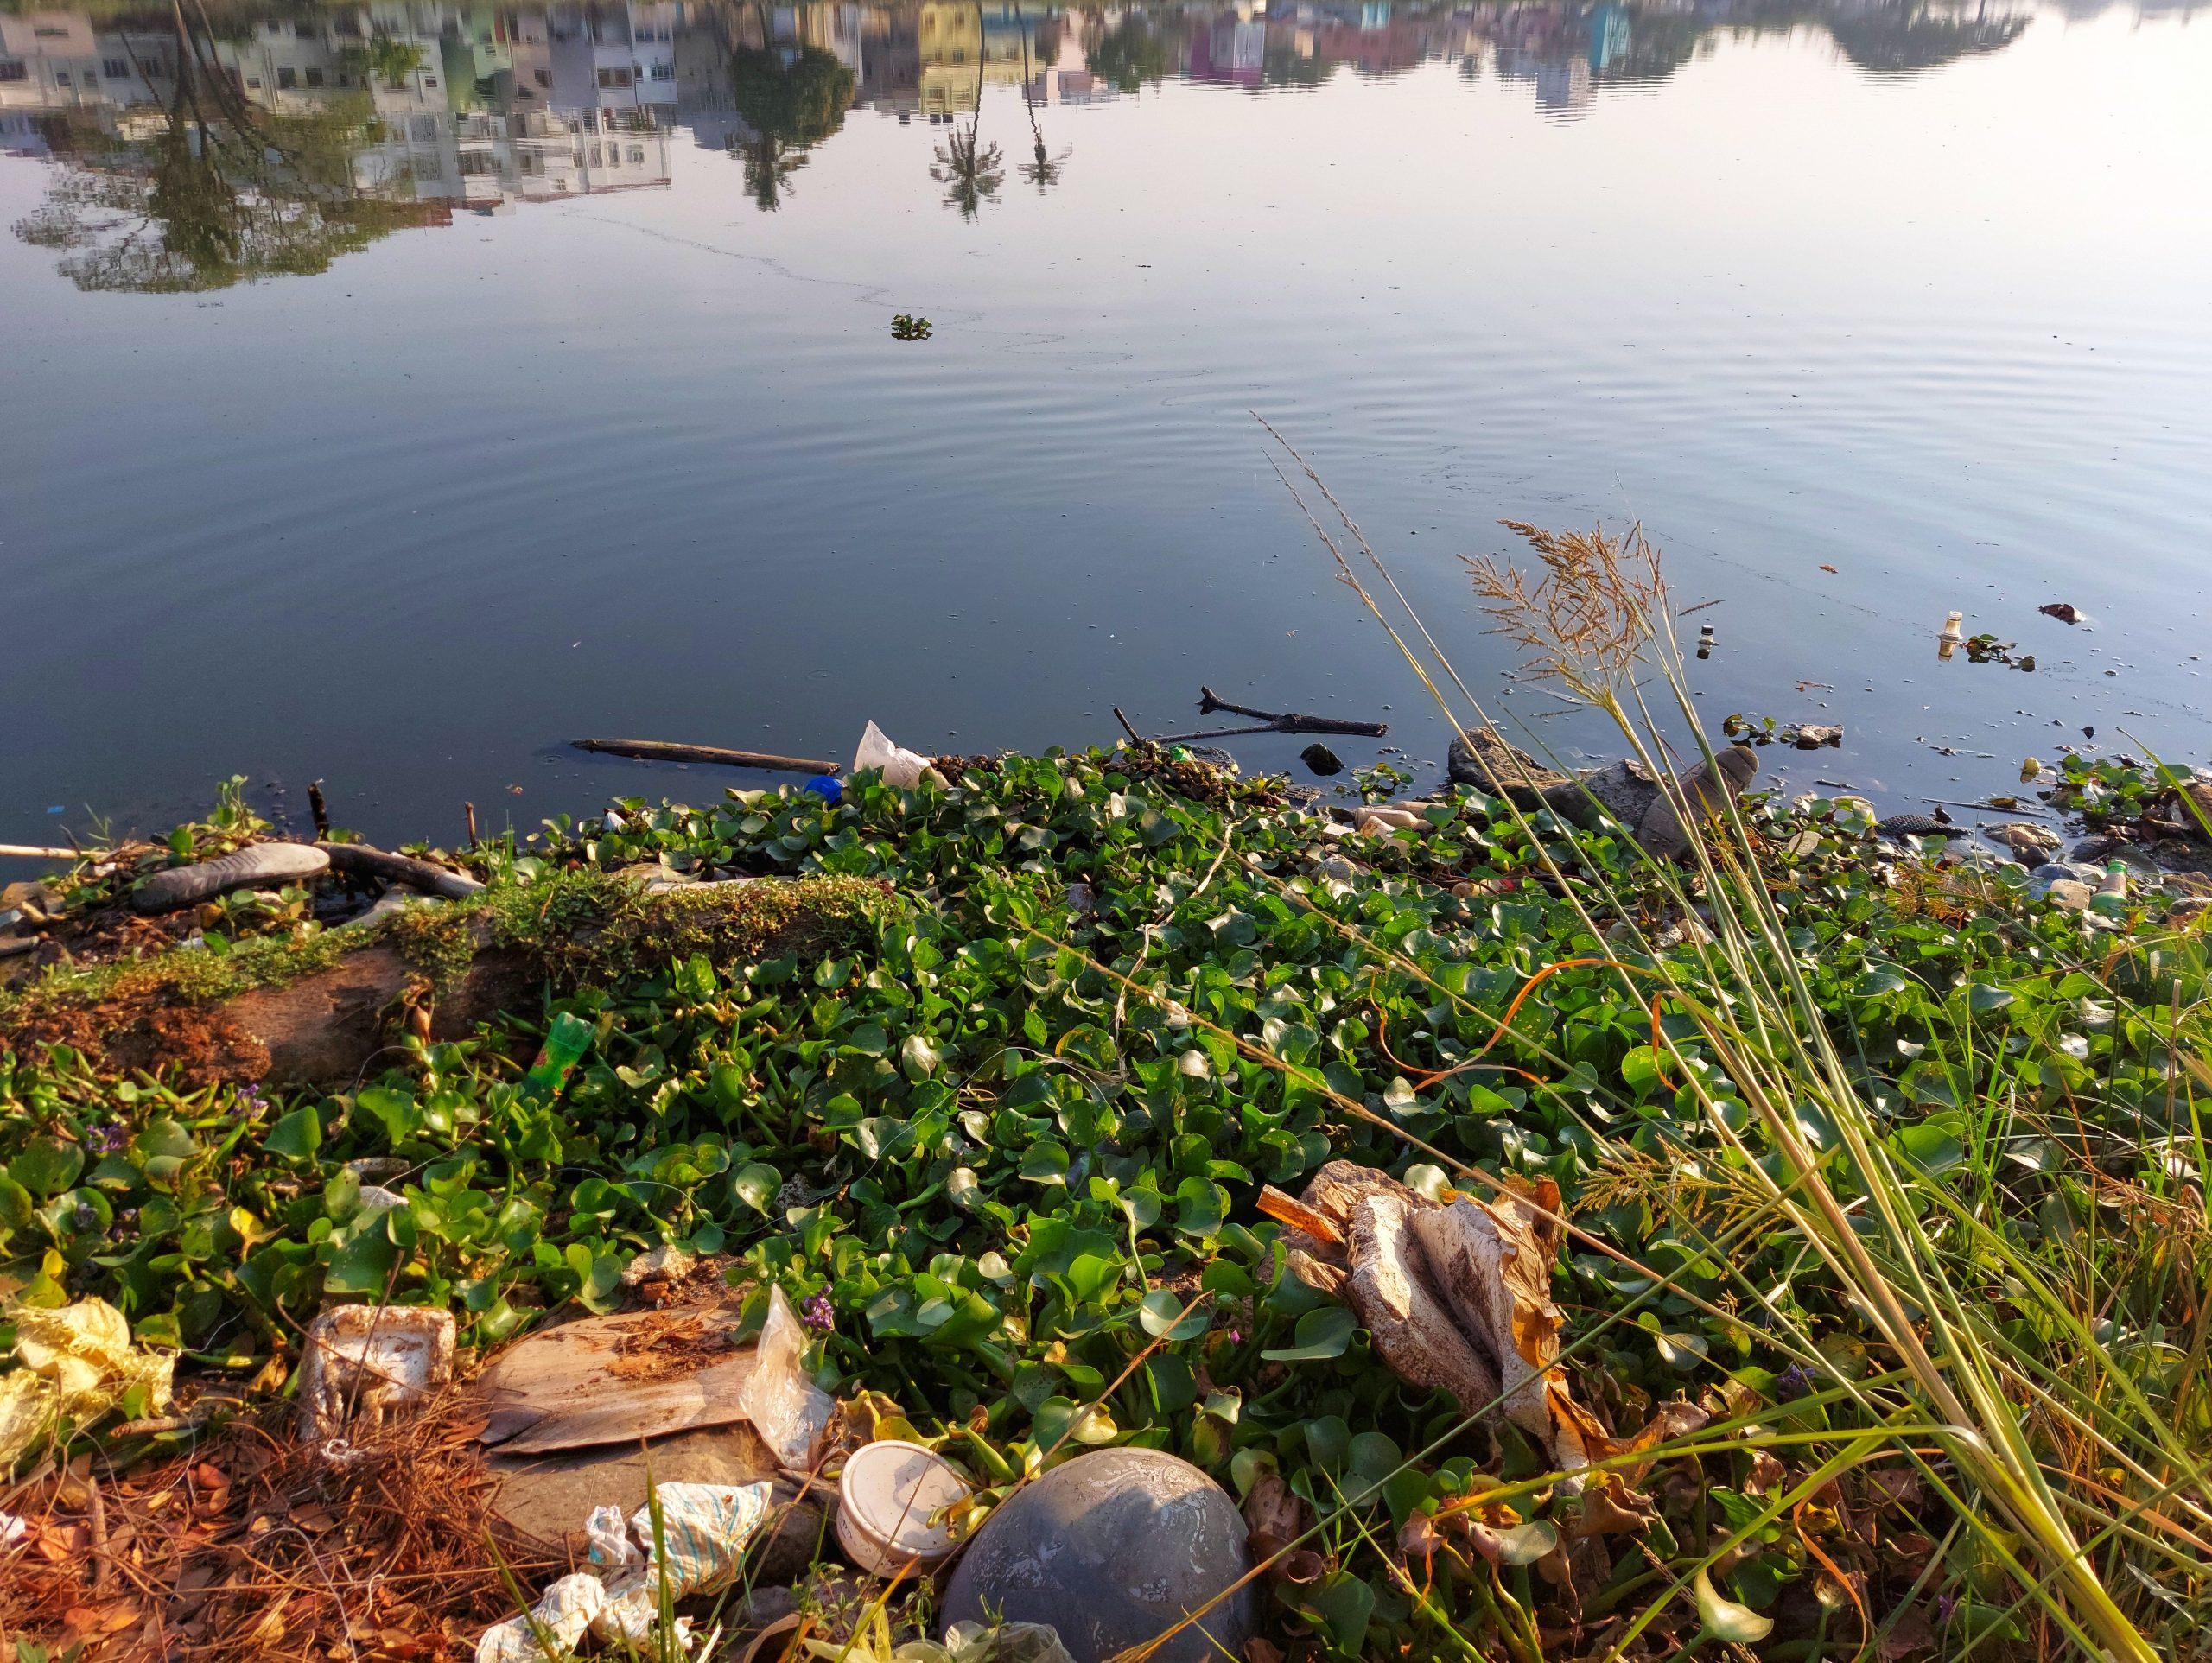 Garbage near a water resource